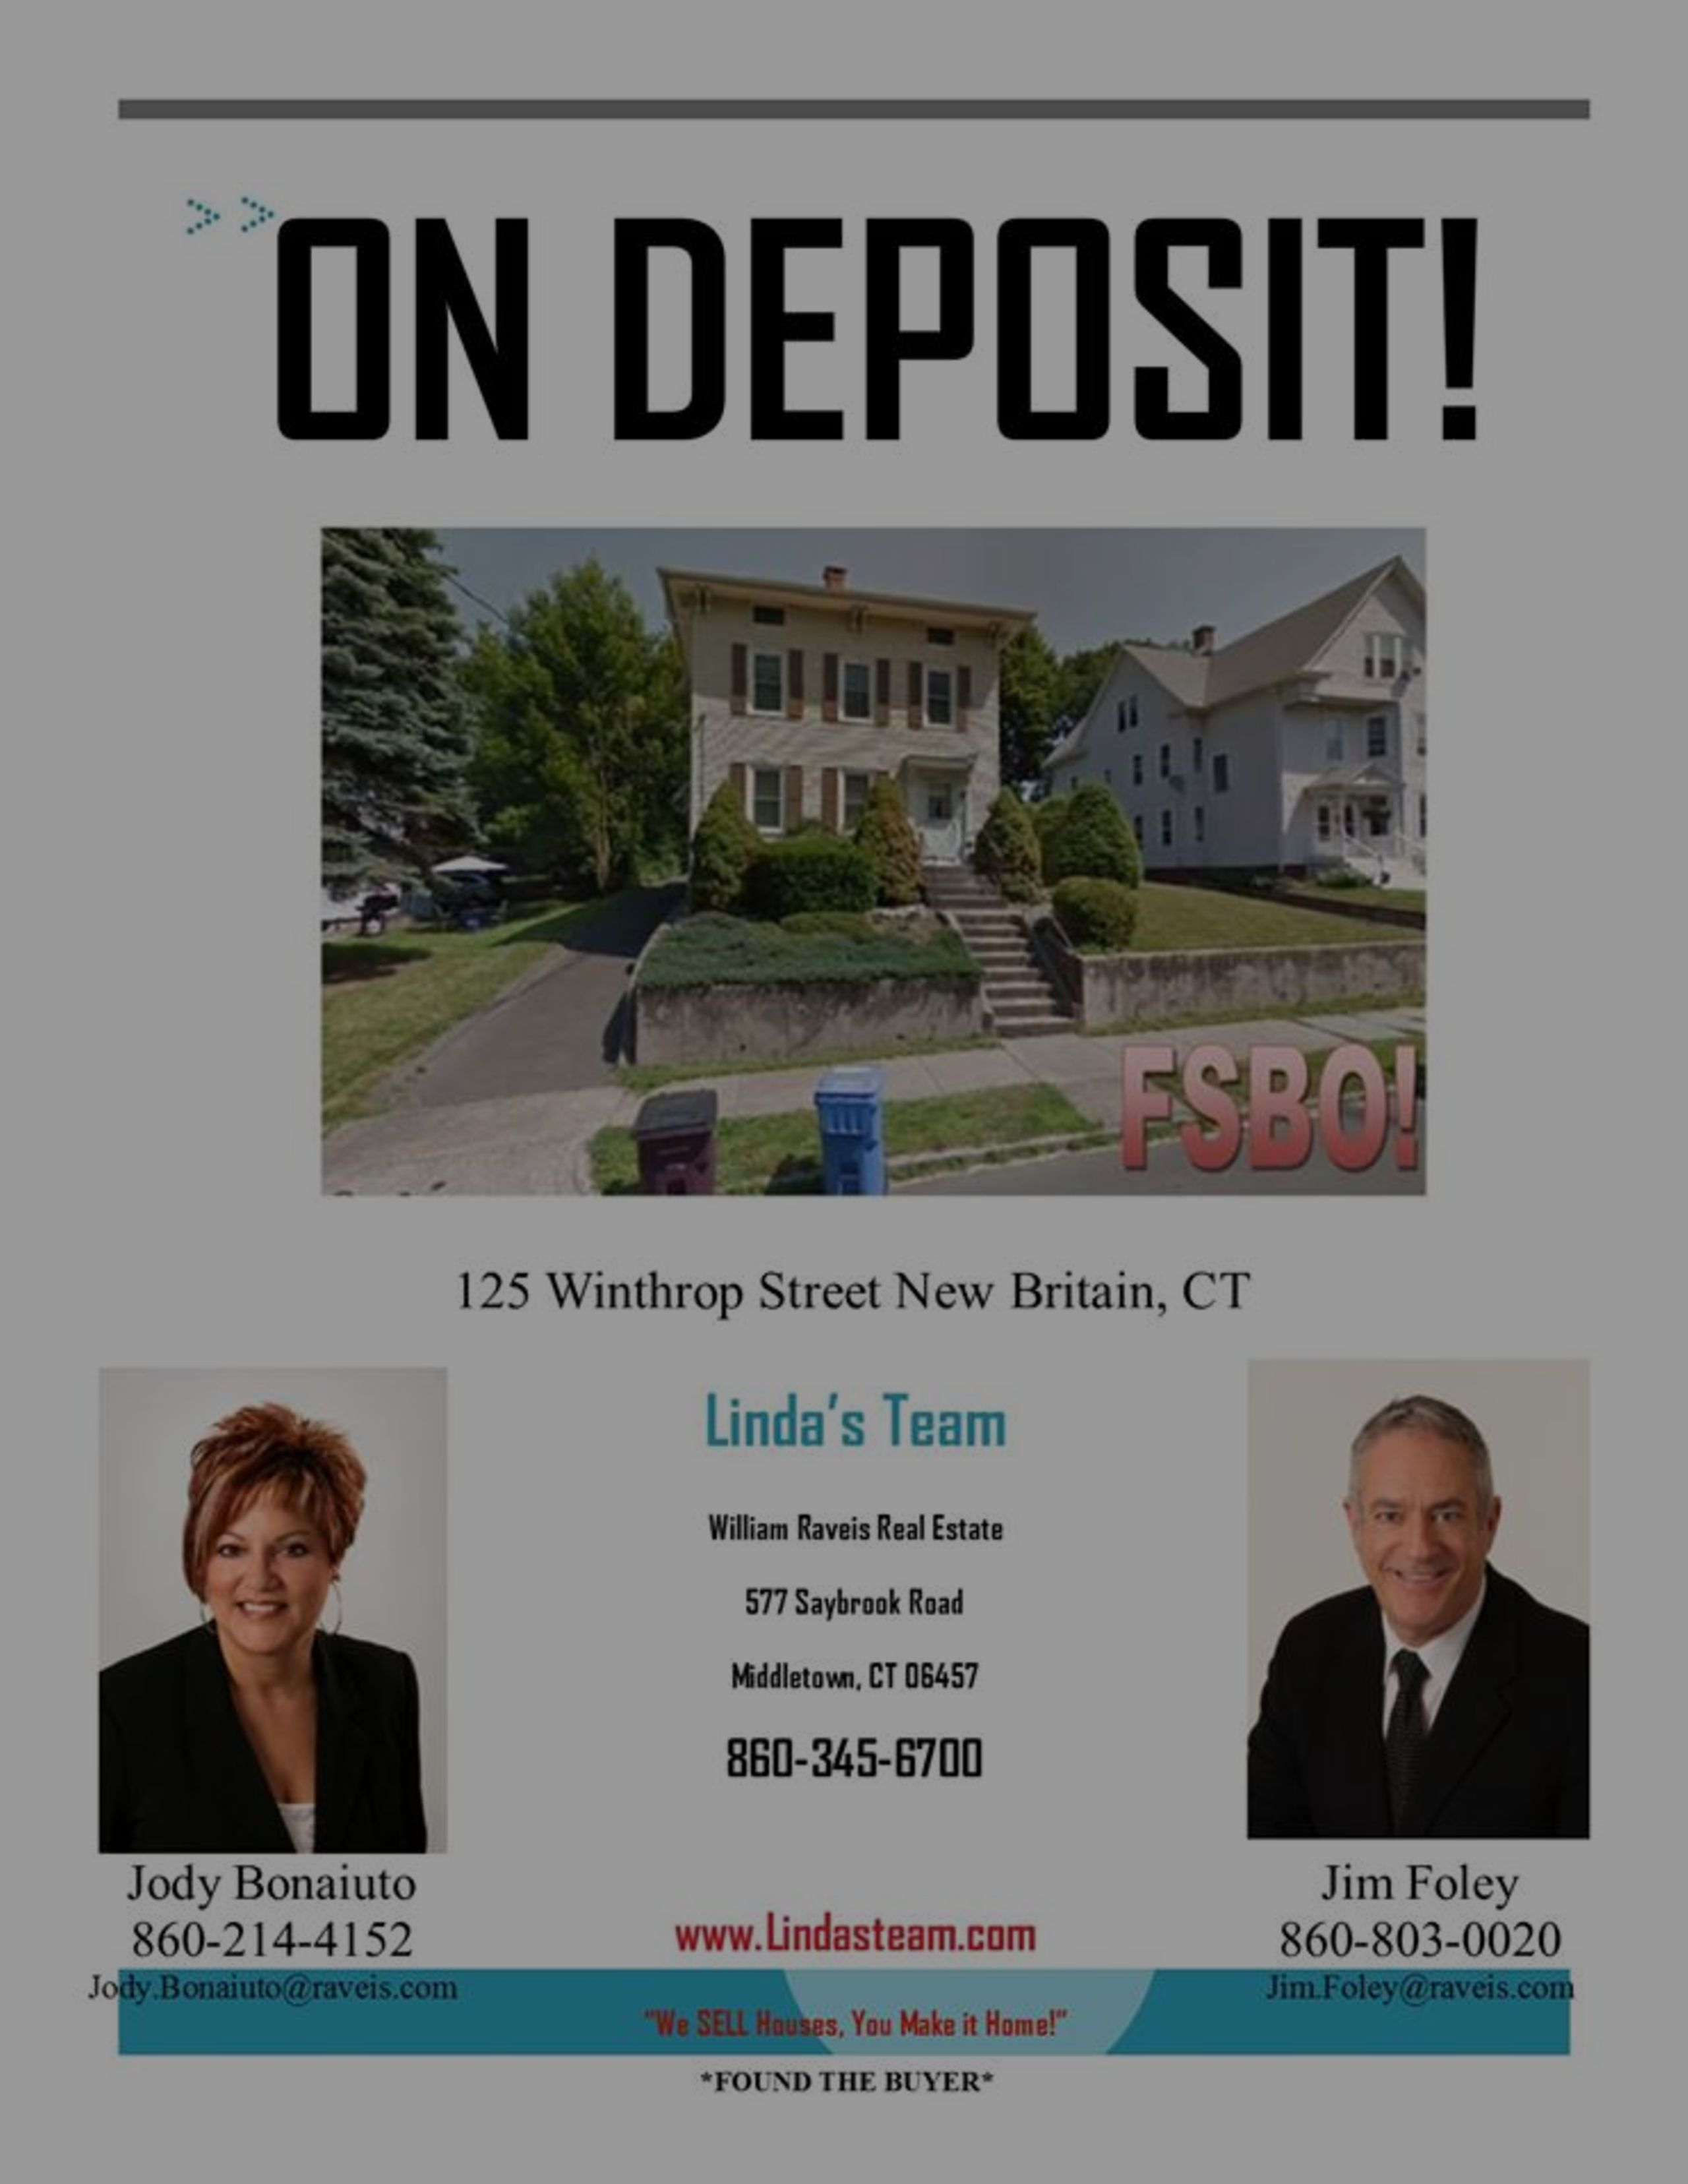 *ON DEPOSIT* 125 Winthrop Street, New Britain, CT